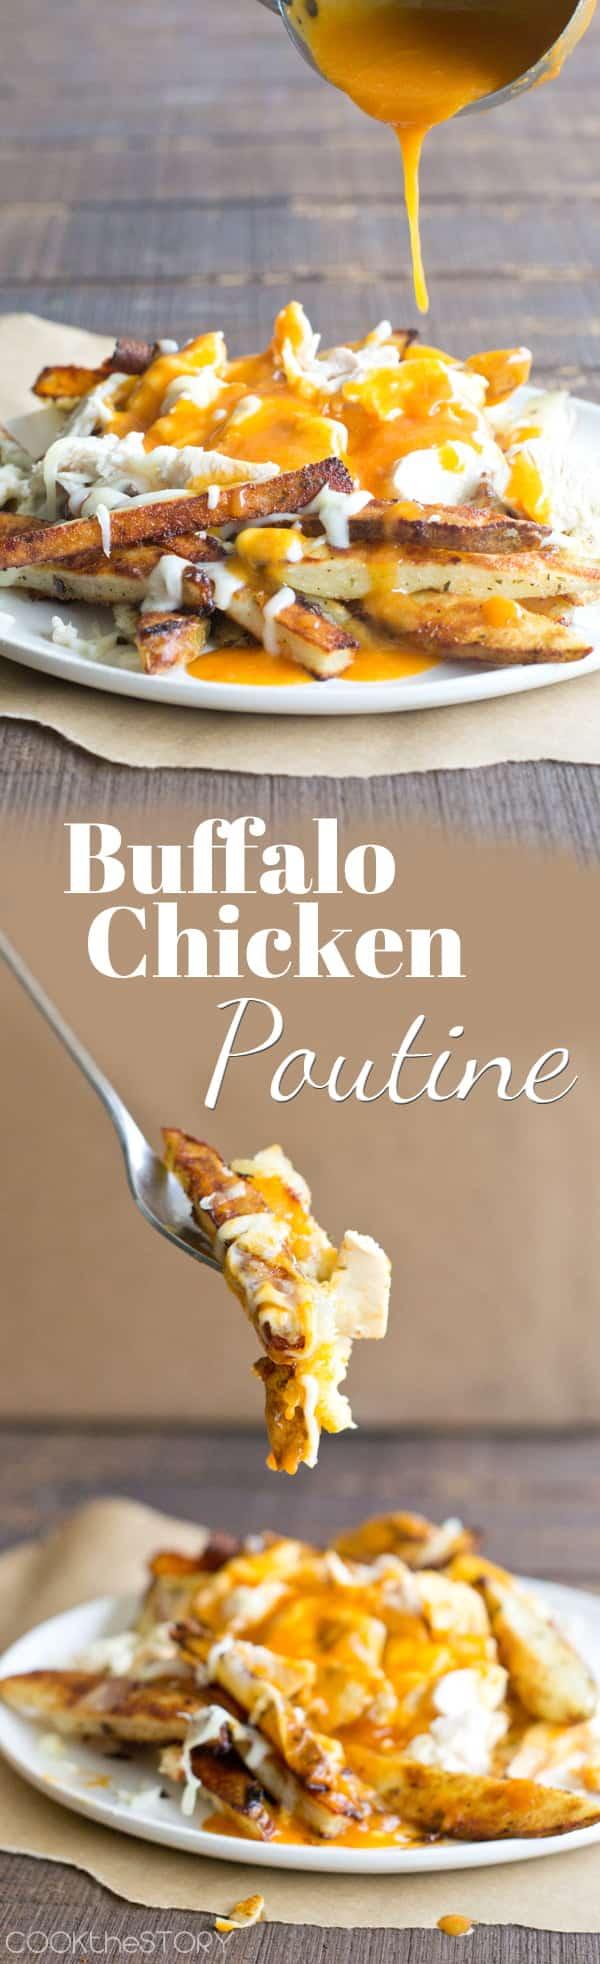 Buffalo Chicken Poutine